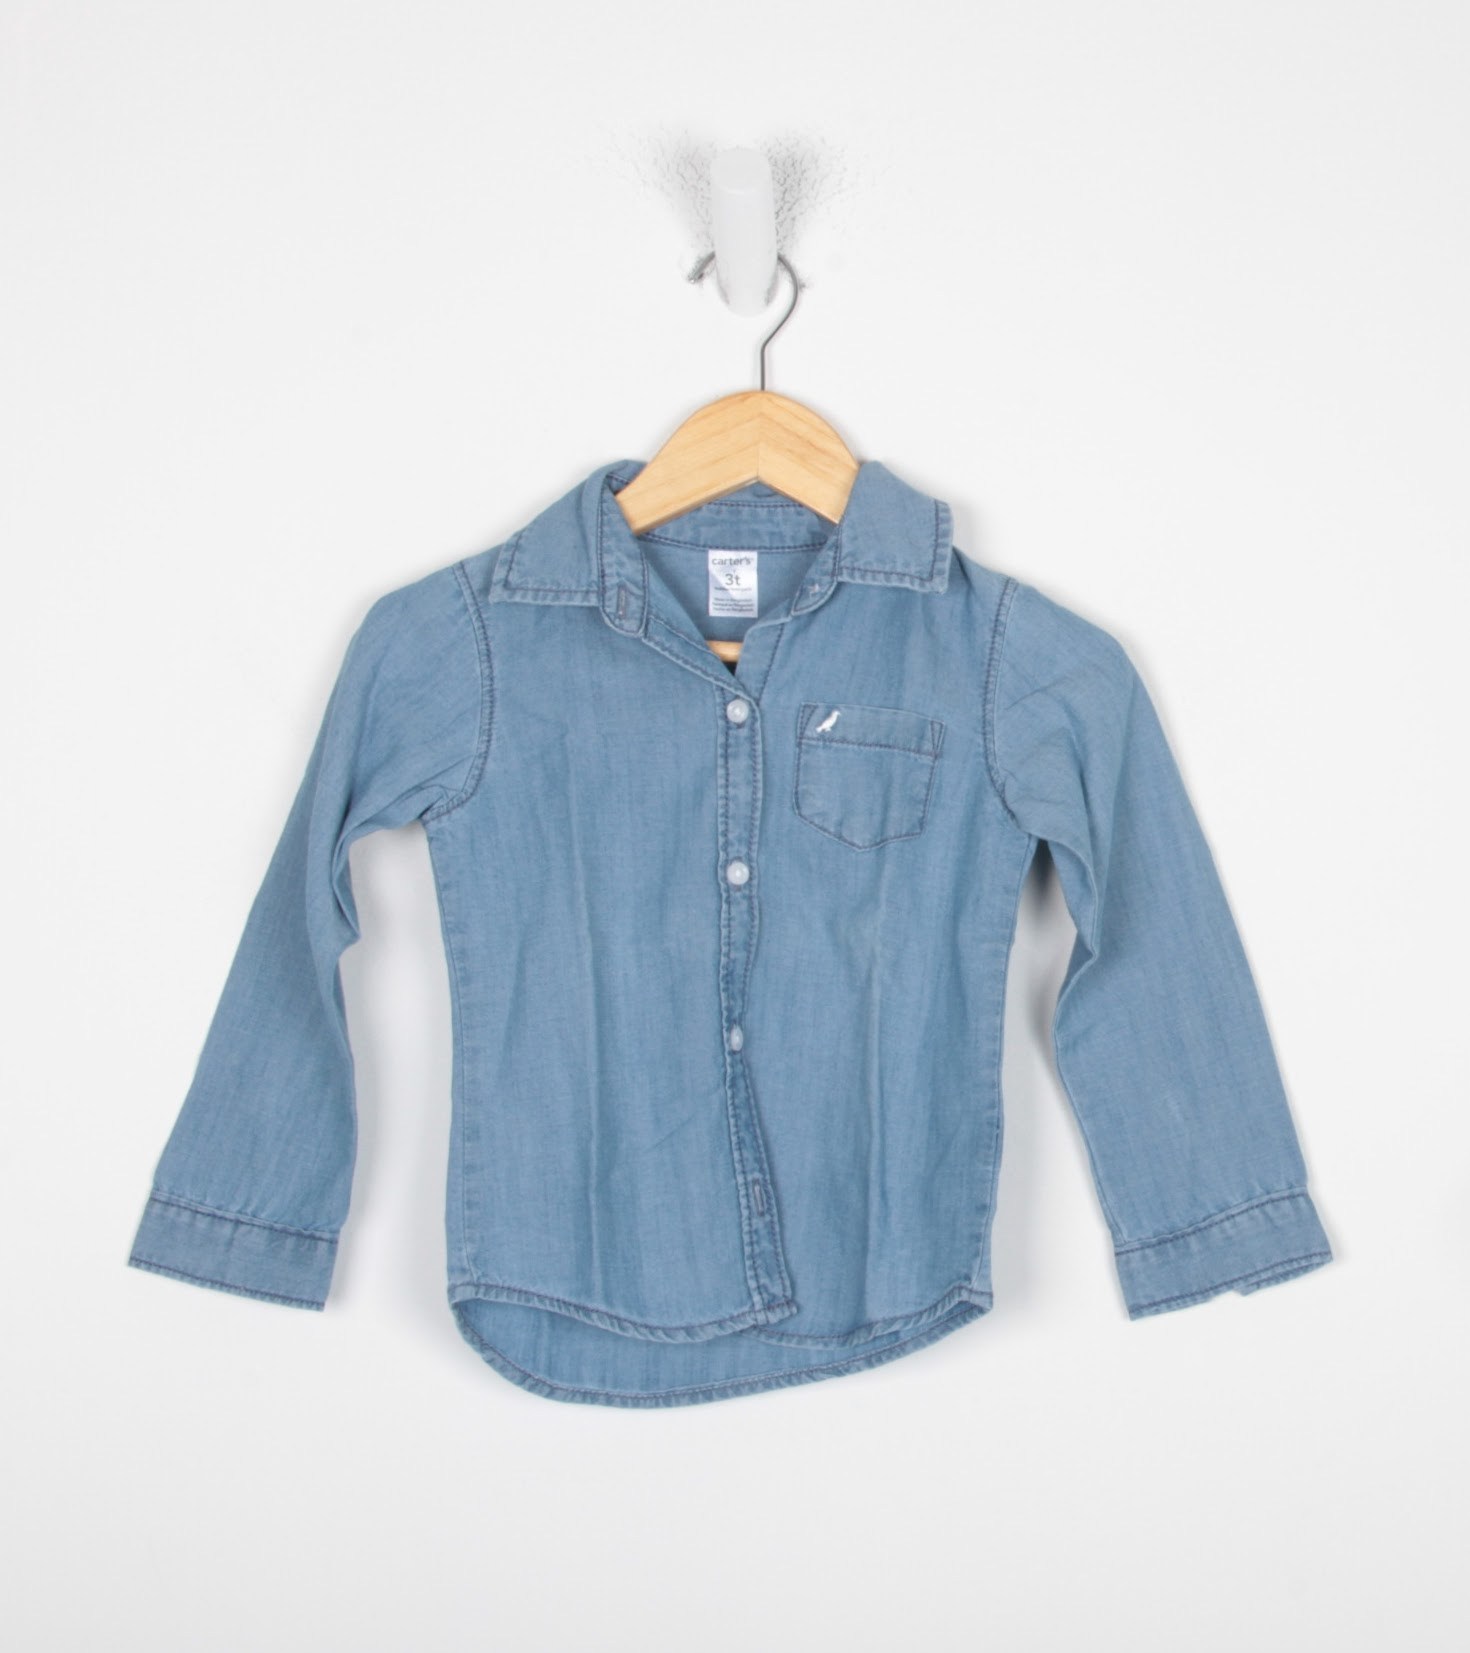 Camisa Manga Longa - Carter's - 3 Anos